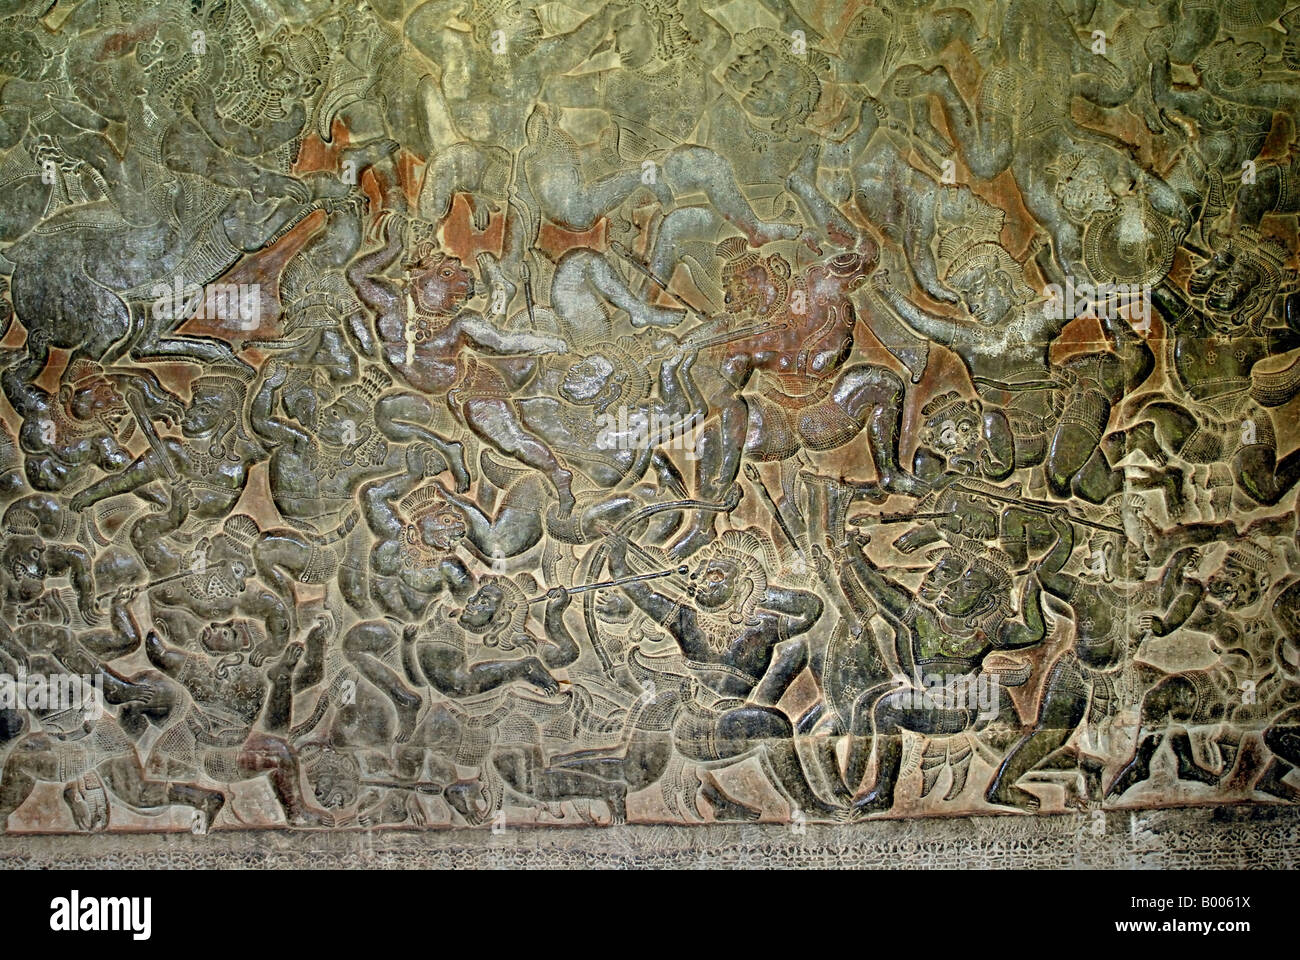 Cambodia, Angkor Wat, early 12th century. Battle scene. Eastern gallery. - Stock Image